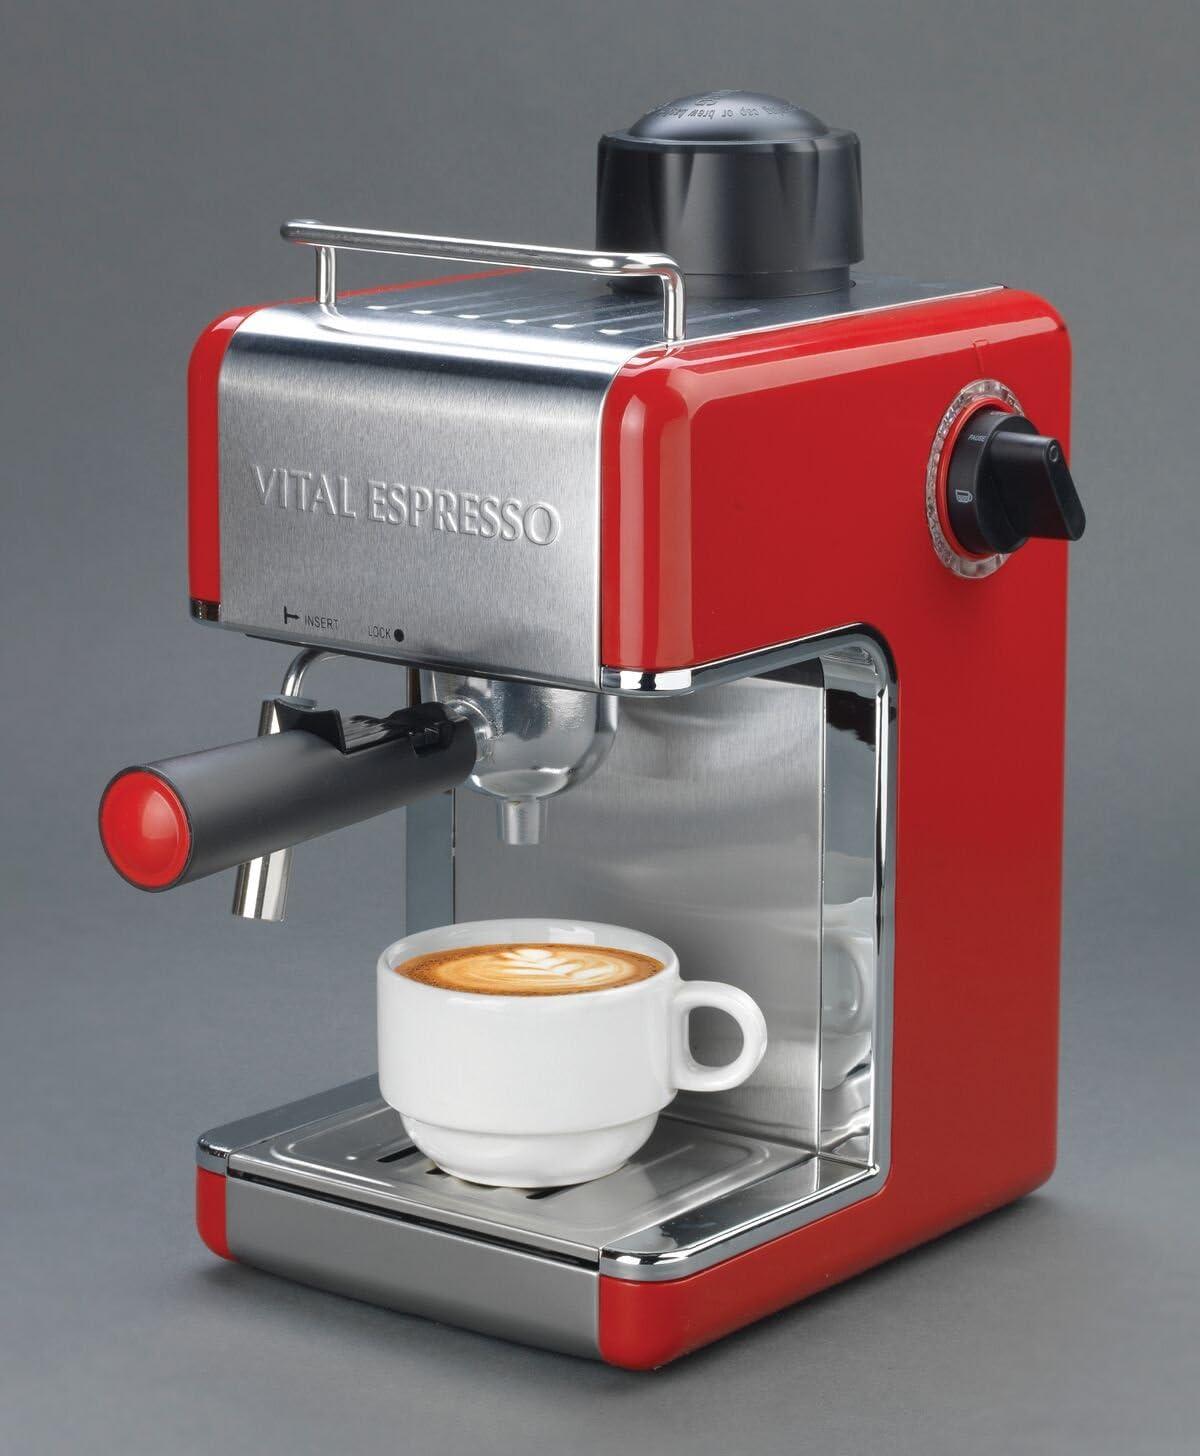 Vital Home - Cafetera Italiana Espresso: Amazon.es: Hogar